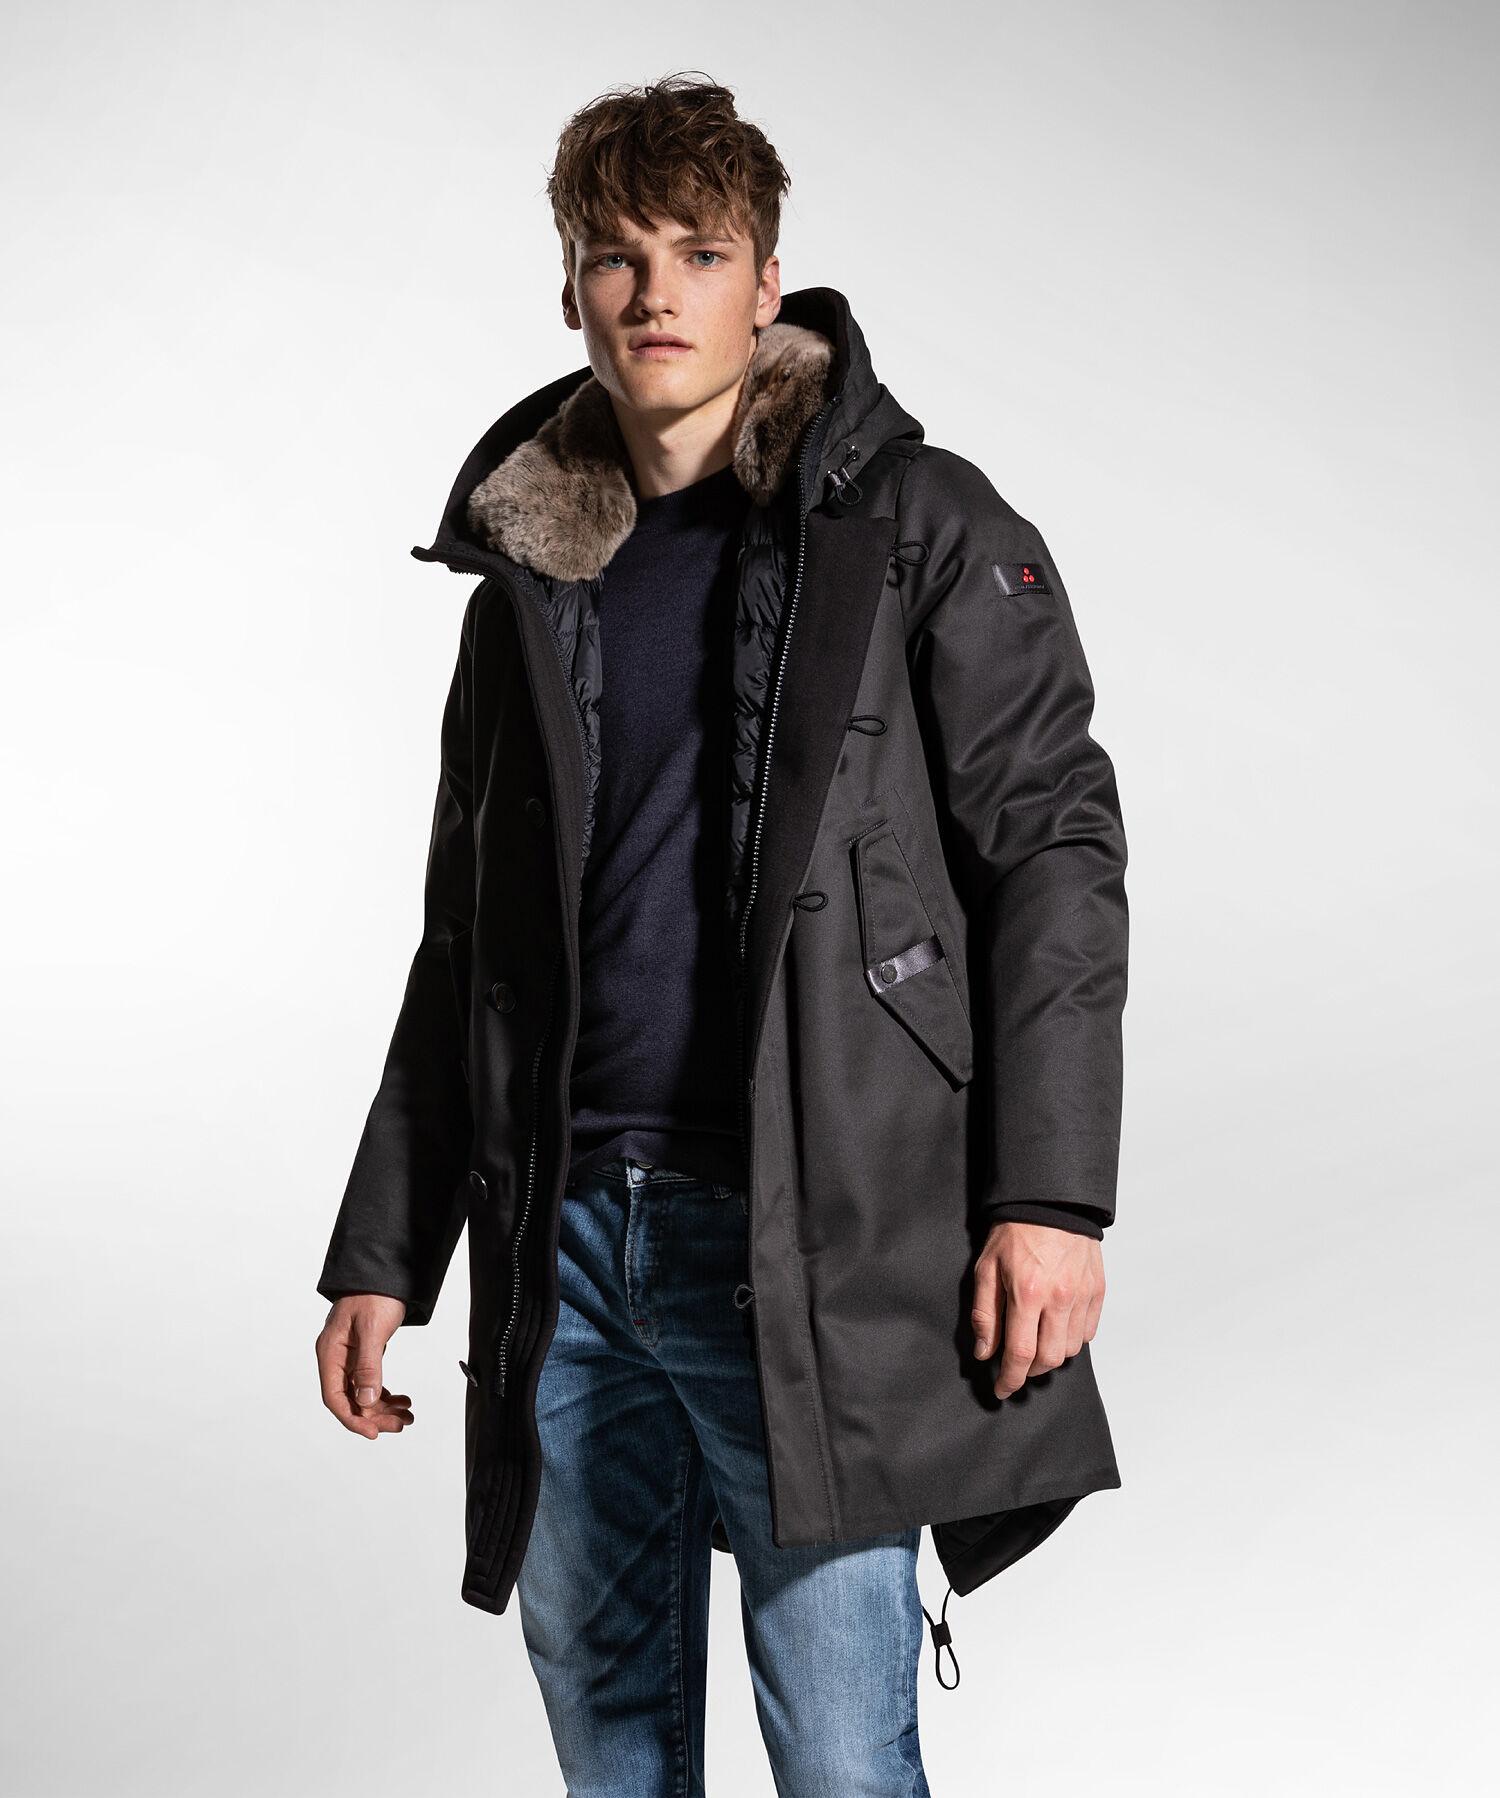 Heritage military jacket - Peuterey